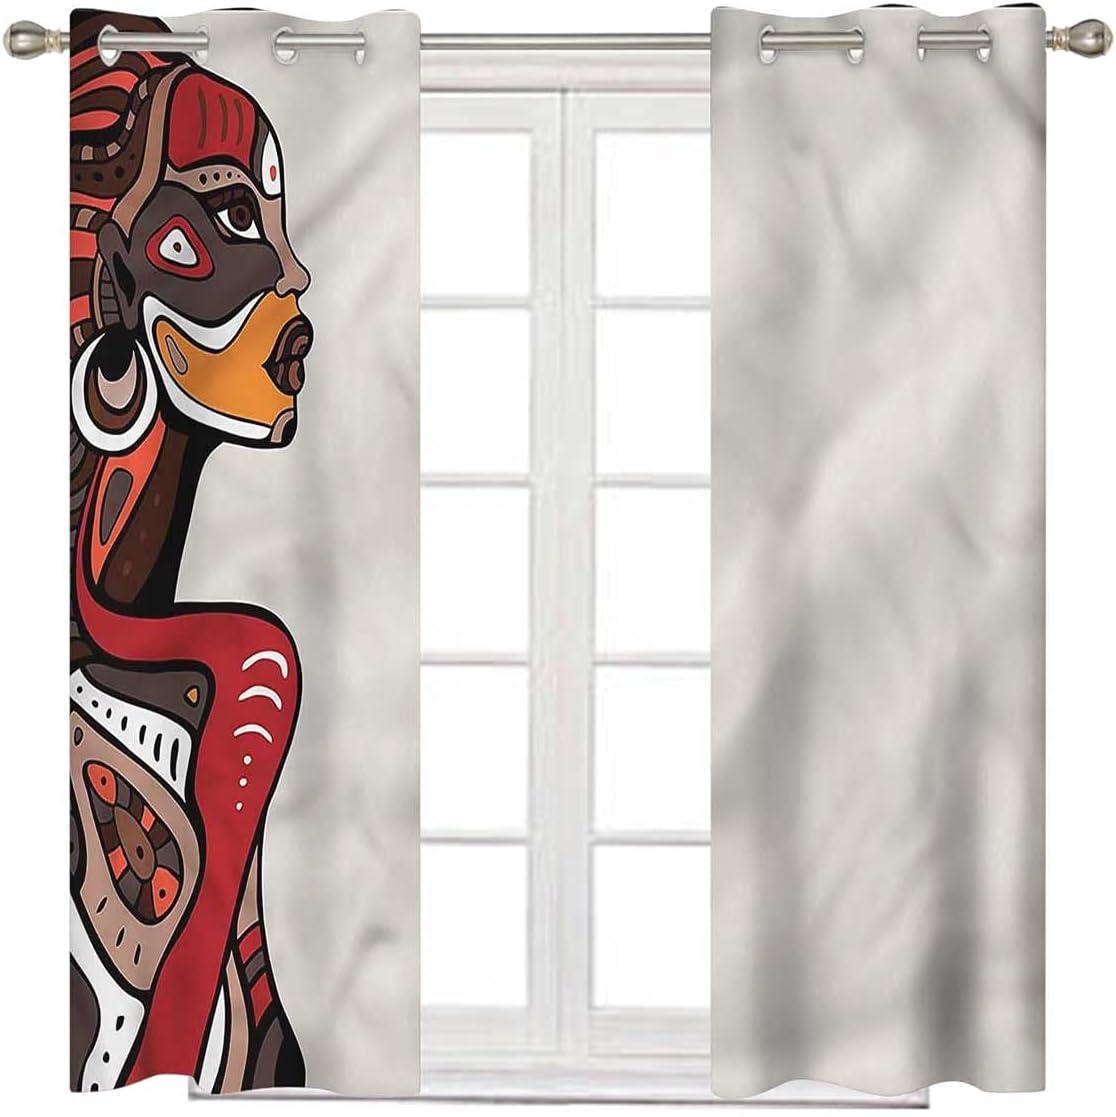 African Kids Blackout Curtains 72 Fashio Popular standard Genuine Inch Ethno Long